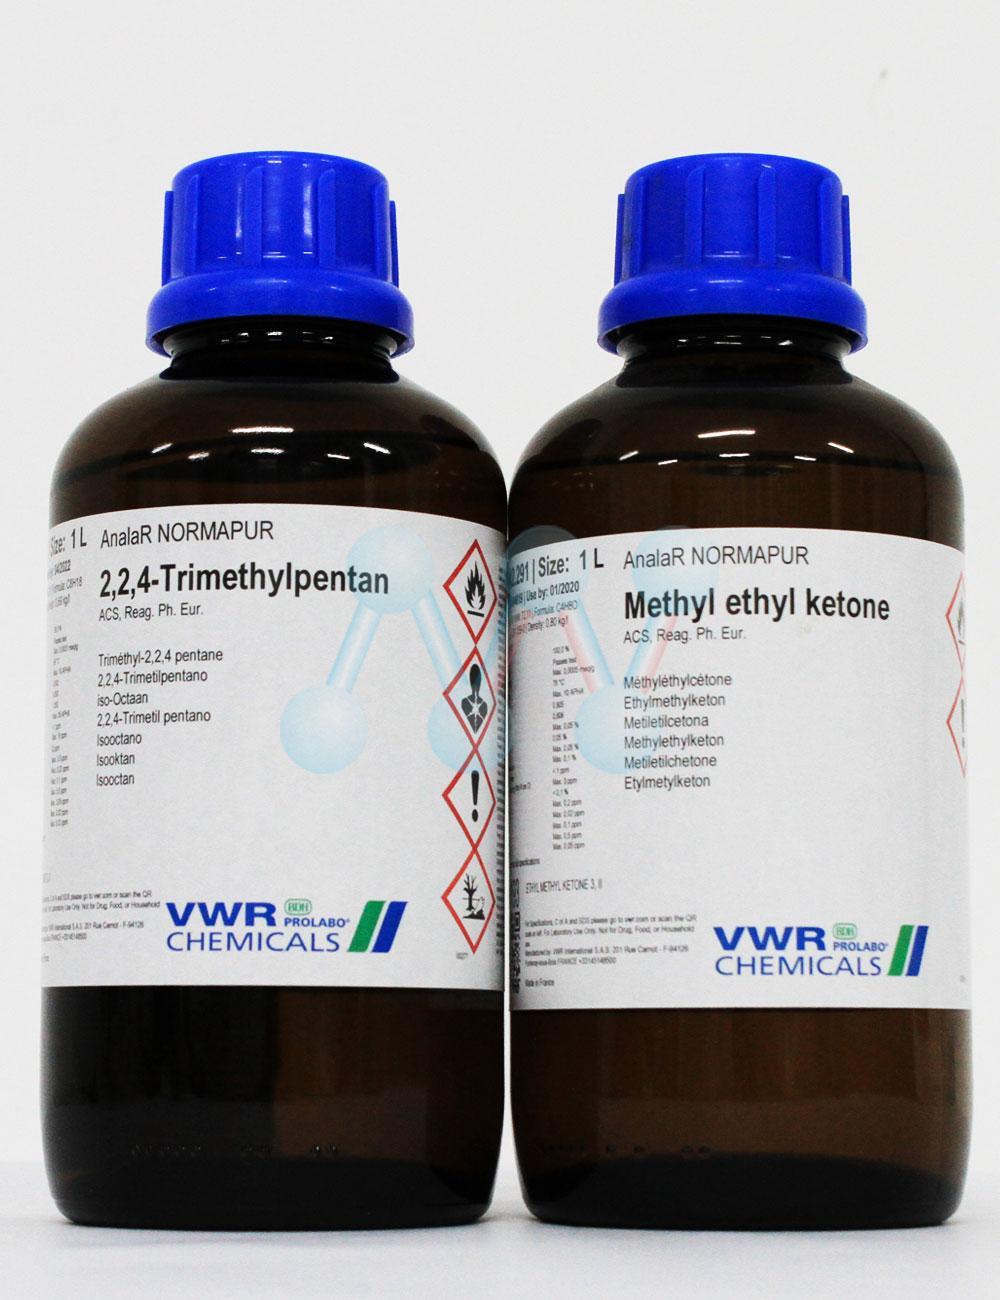 Methyl iso butyl ketone